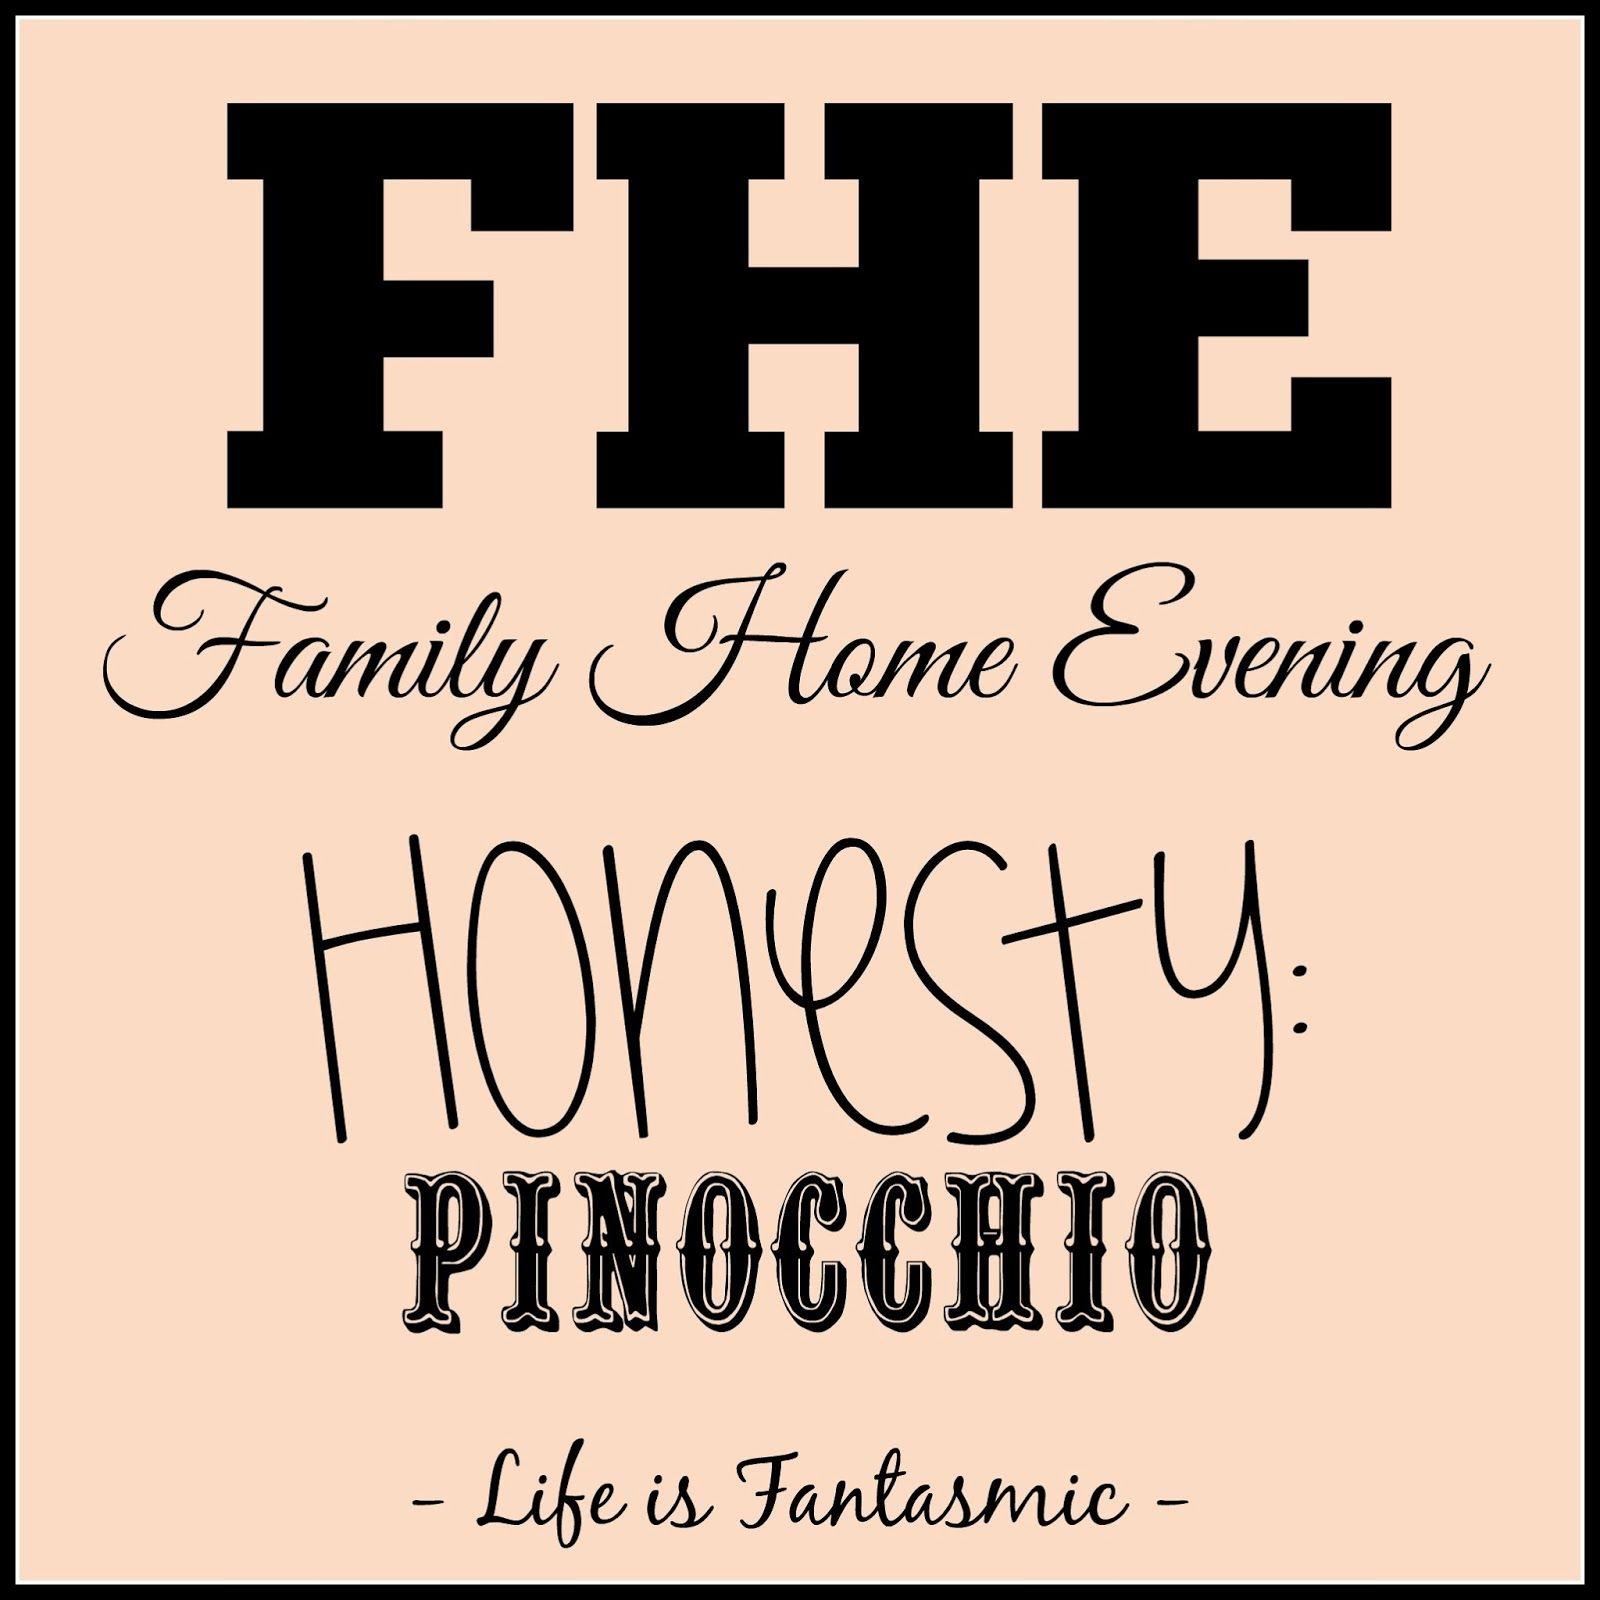 life is fantasmic fhe honesty pinocchio fhe ideas pinterest